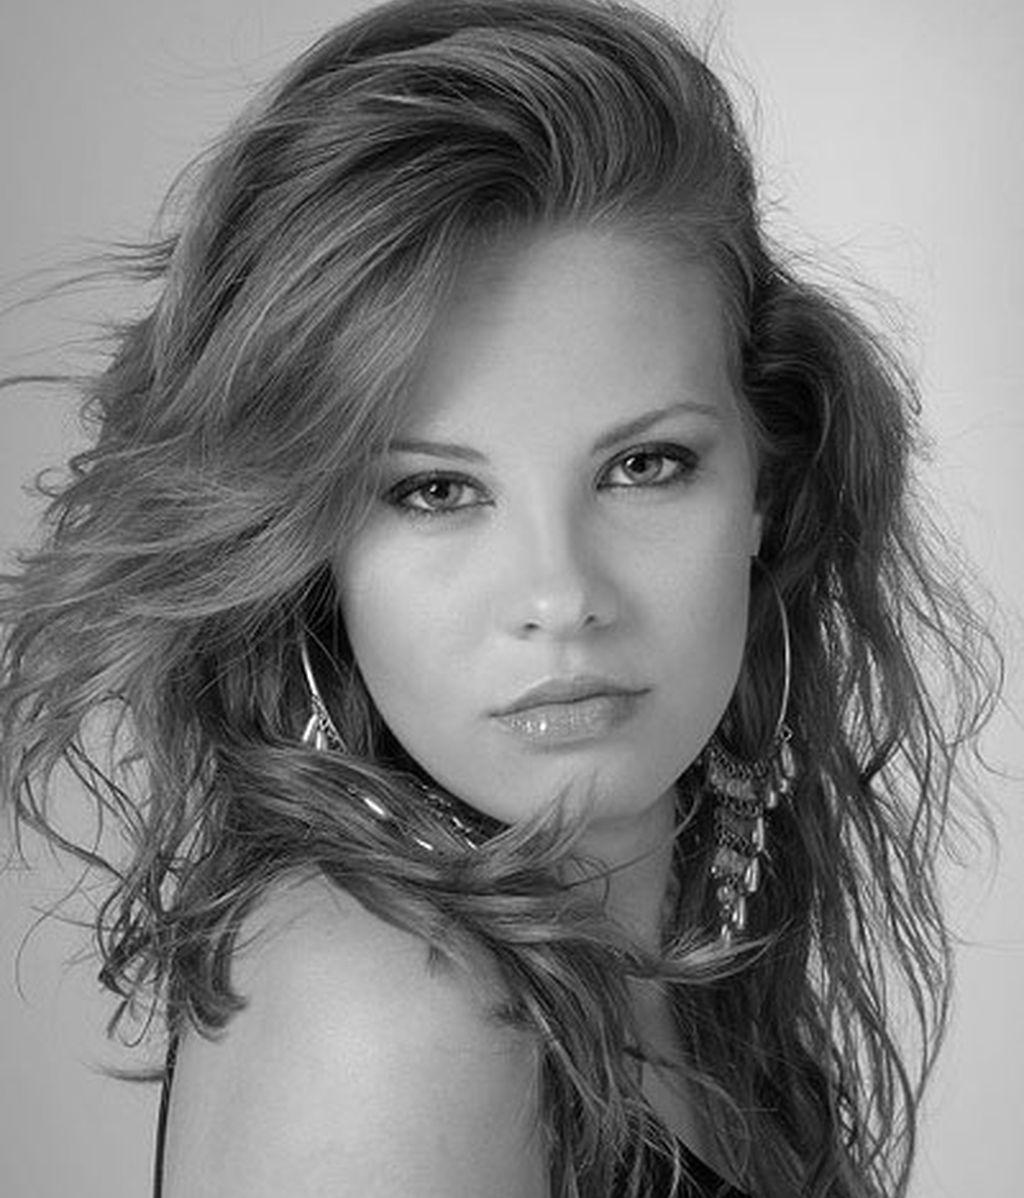 Jessica, la novia modelo de Feliciano